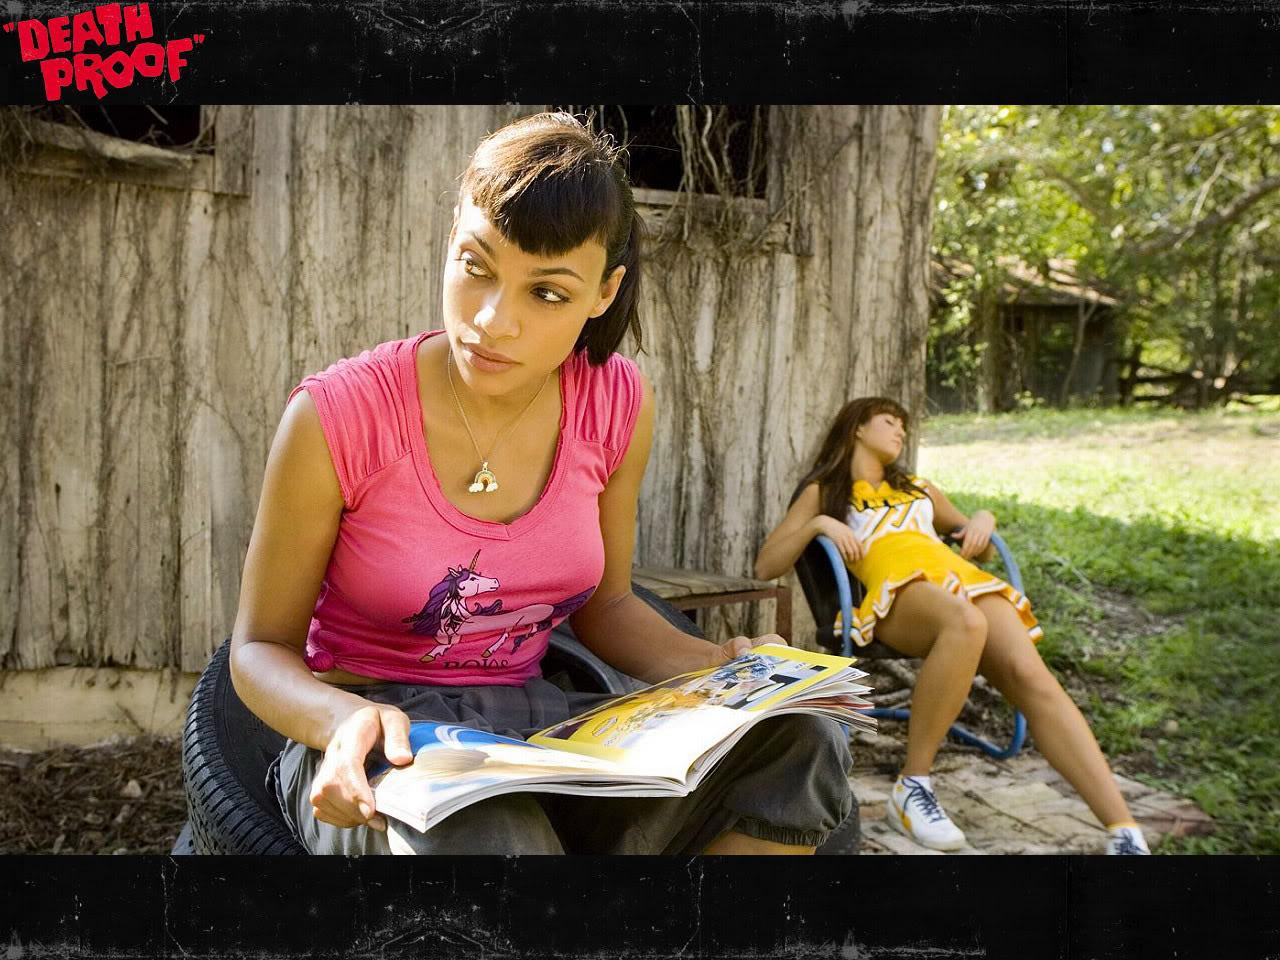 http://1.bp.blogspot.com/-H54c2RO0NfQ/TeCHYc0Z7LI/AAAAAAAACXA/JgCiHKpoBPw/s1600/Grindhouse-DeathProofGirls-10.jpg